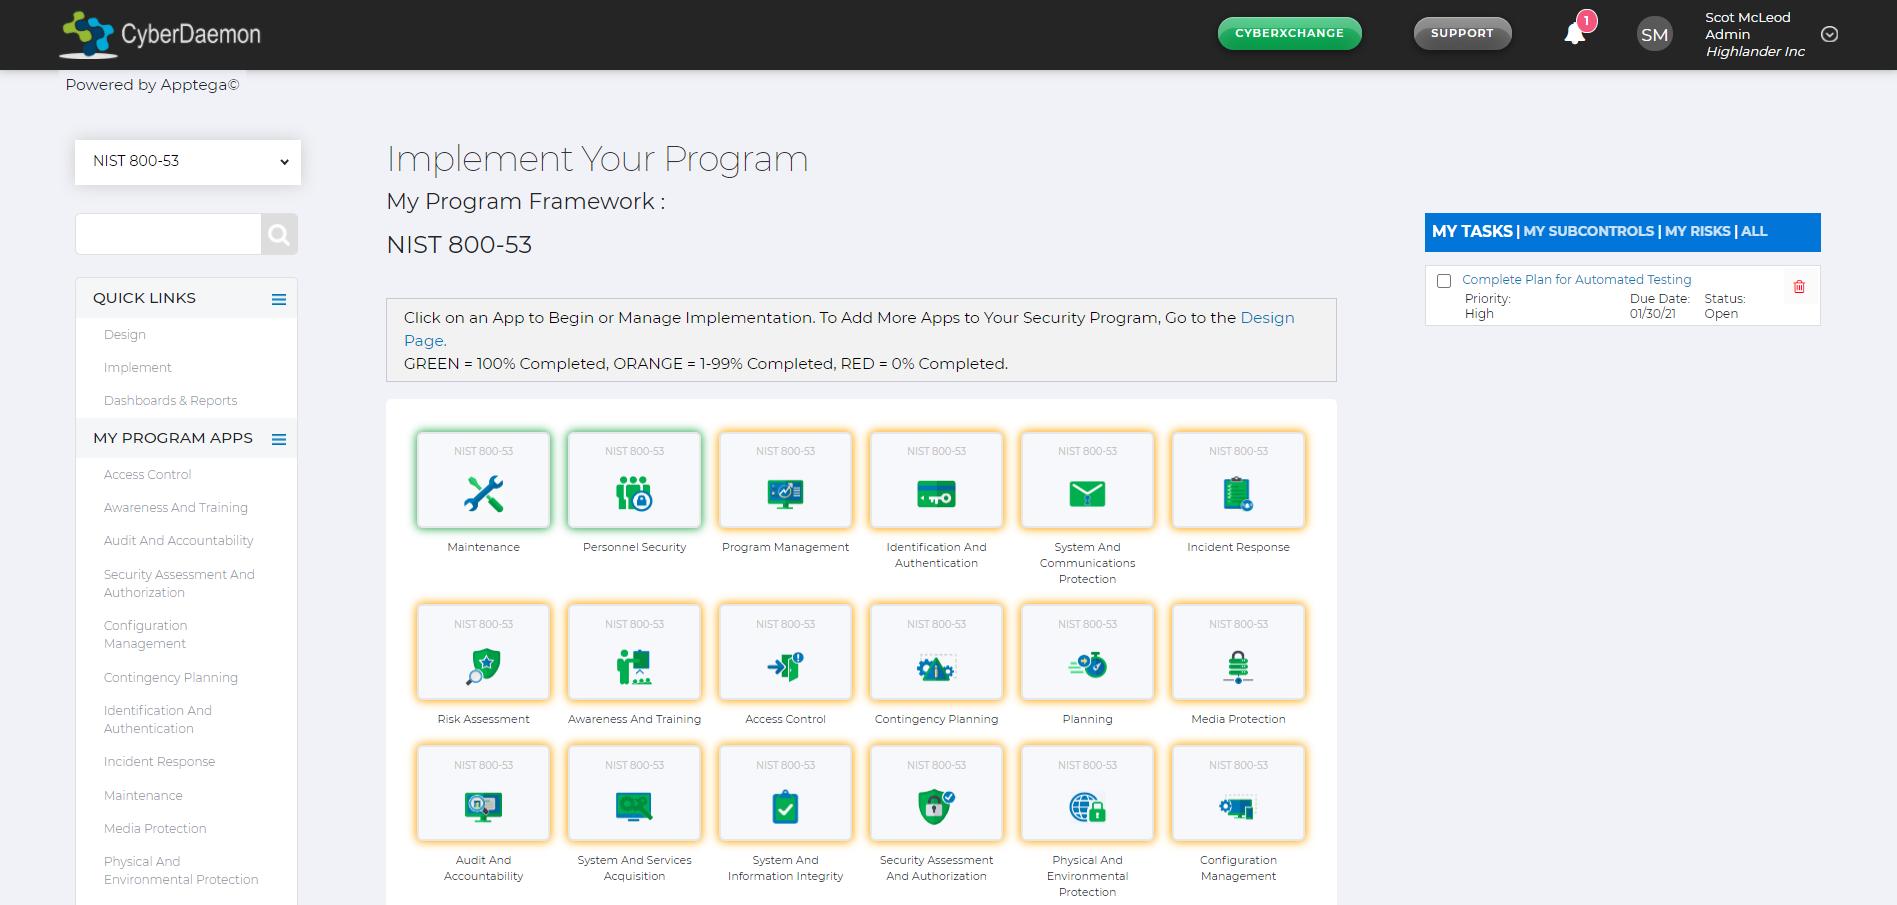 NIST 800-53 Implementation Screenshot